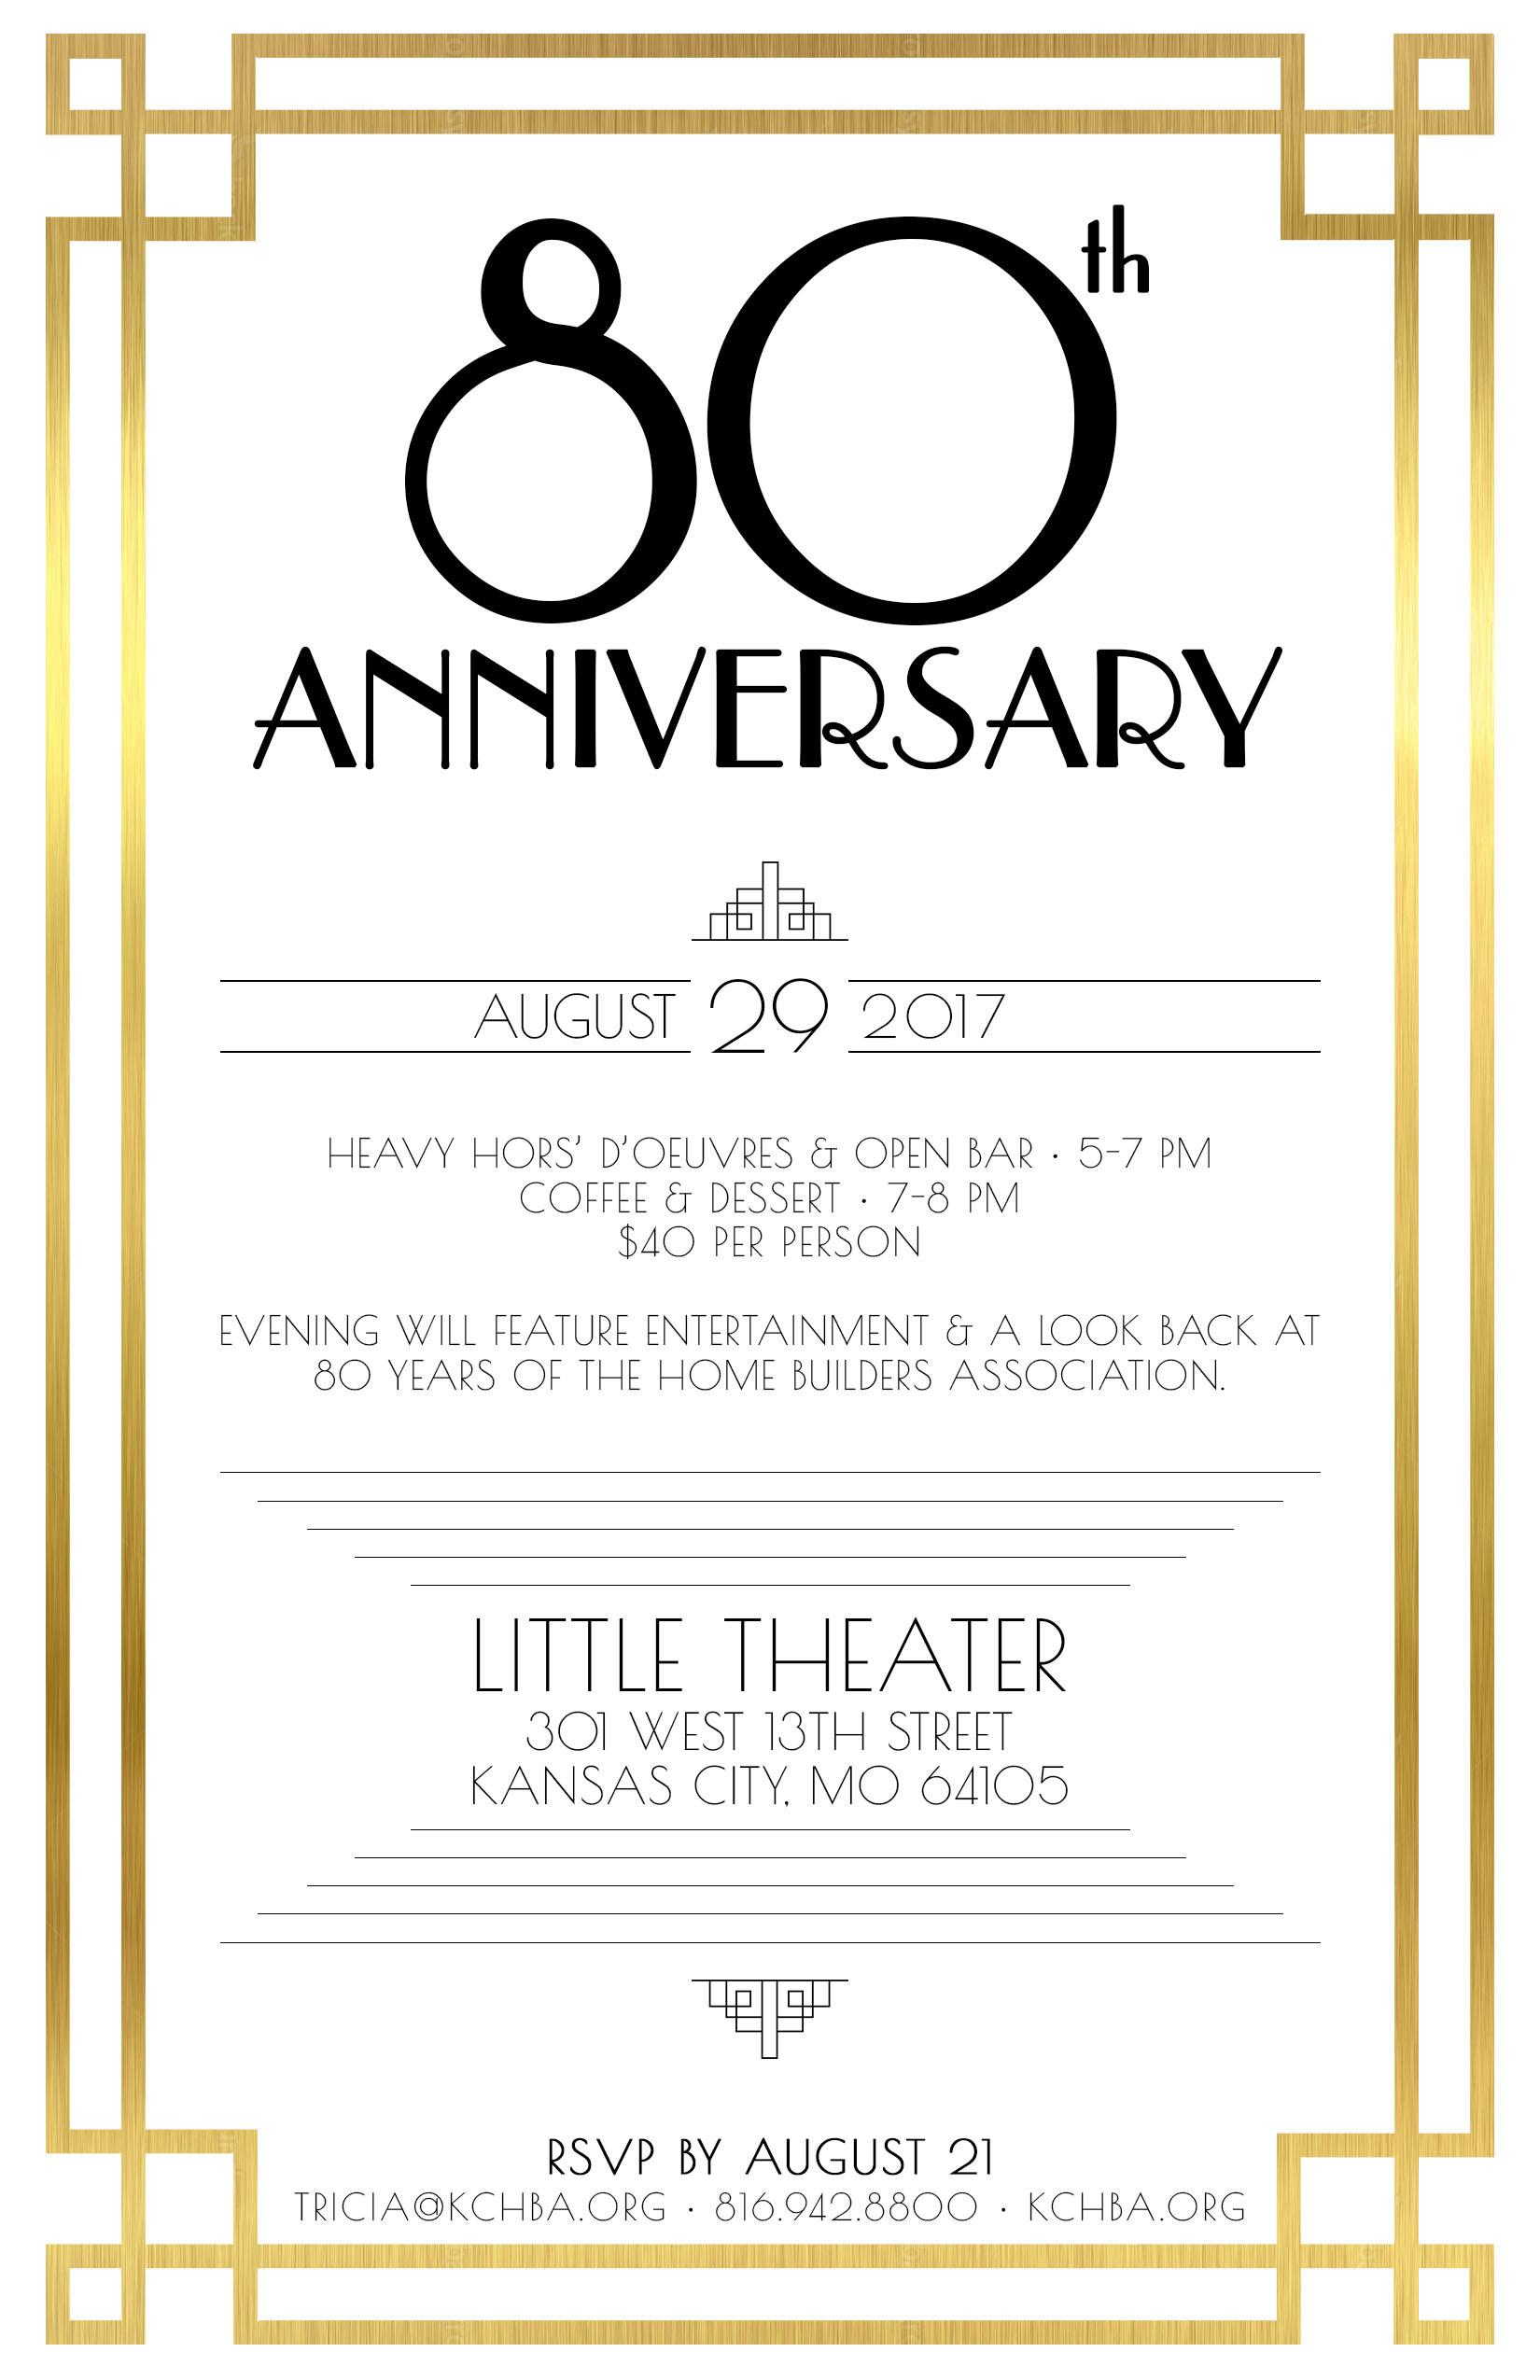 Free Templates For Birthday Invitations  Free Printable 80th Birthday Invitations – Bagvania FREE